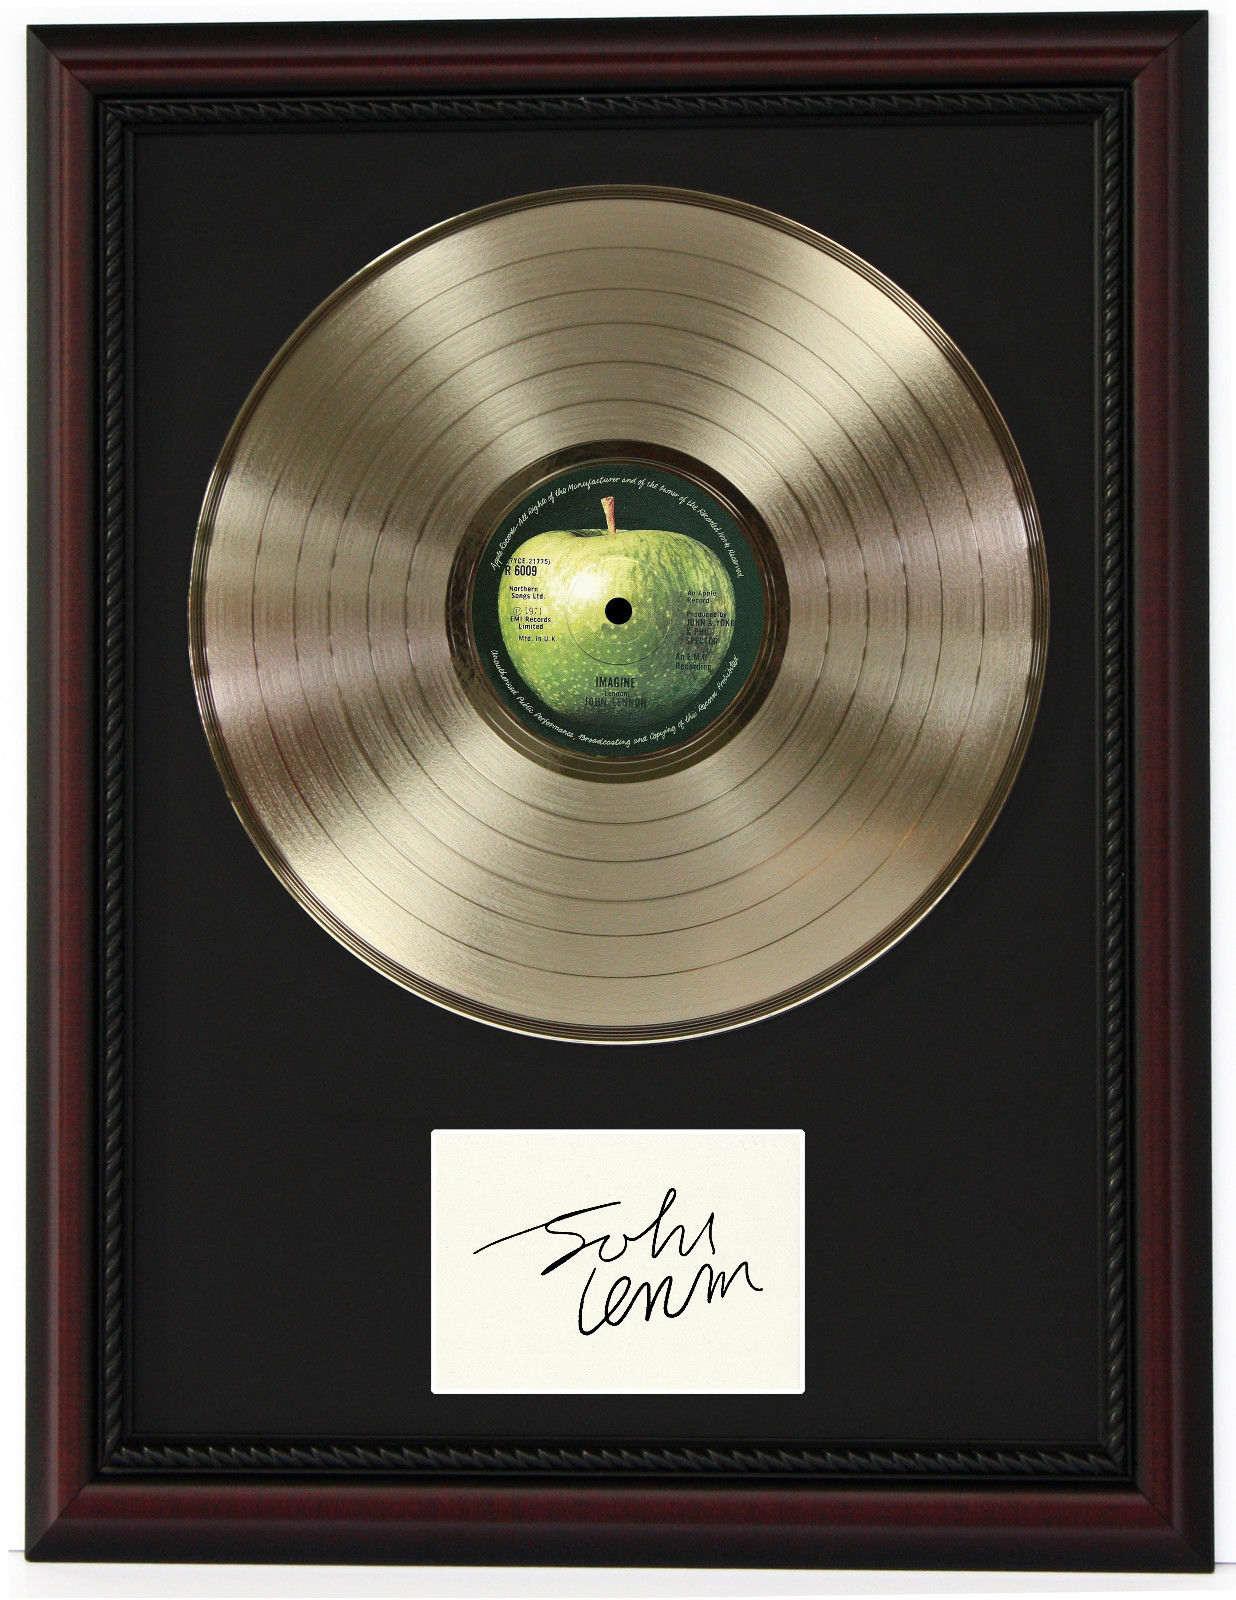 JOHN LENNON CHERRY WOOD FRAMED GOLD LP LTD SIGNATURE RECORD DISPLAY ...